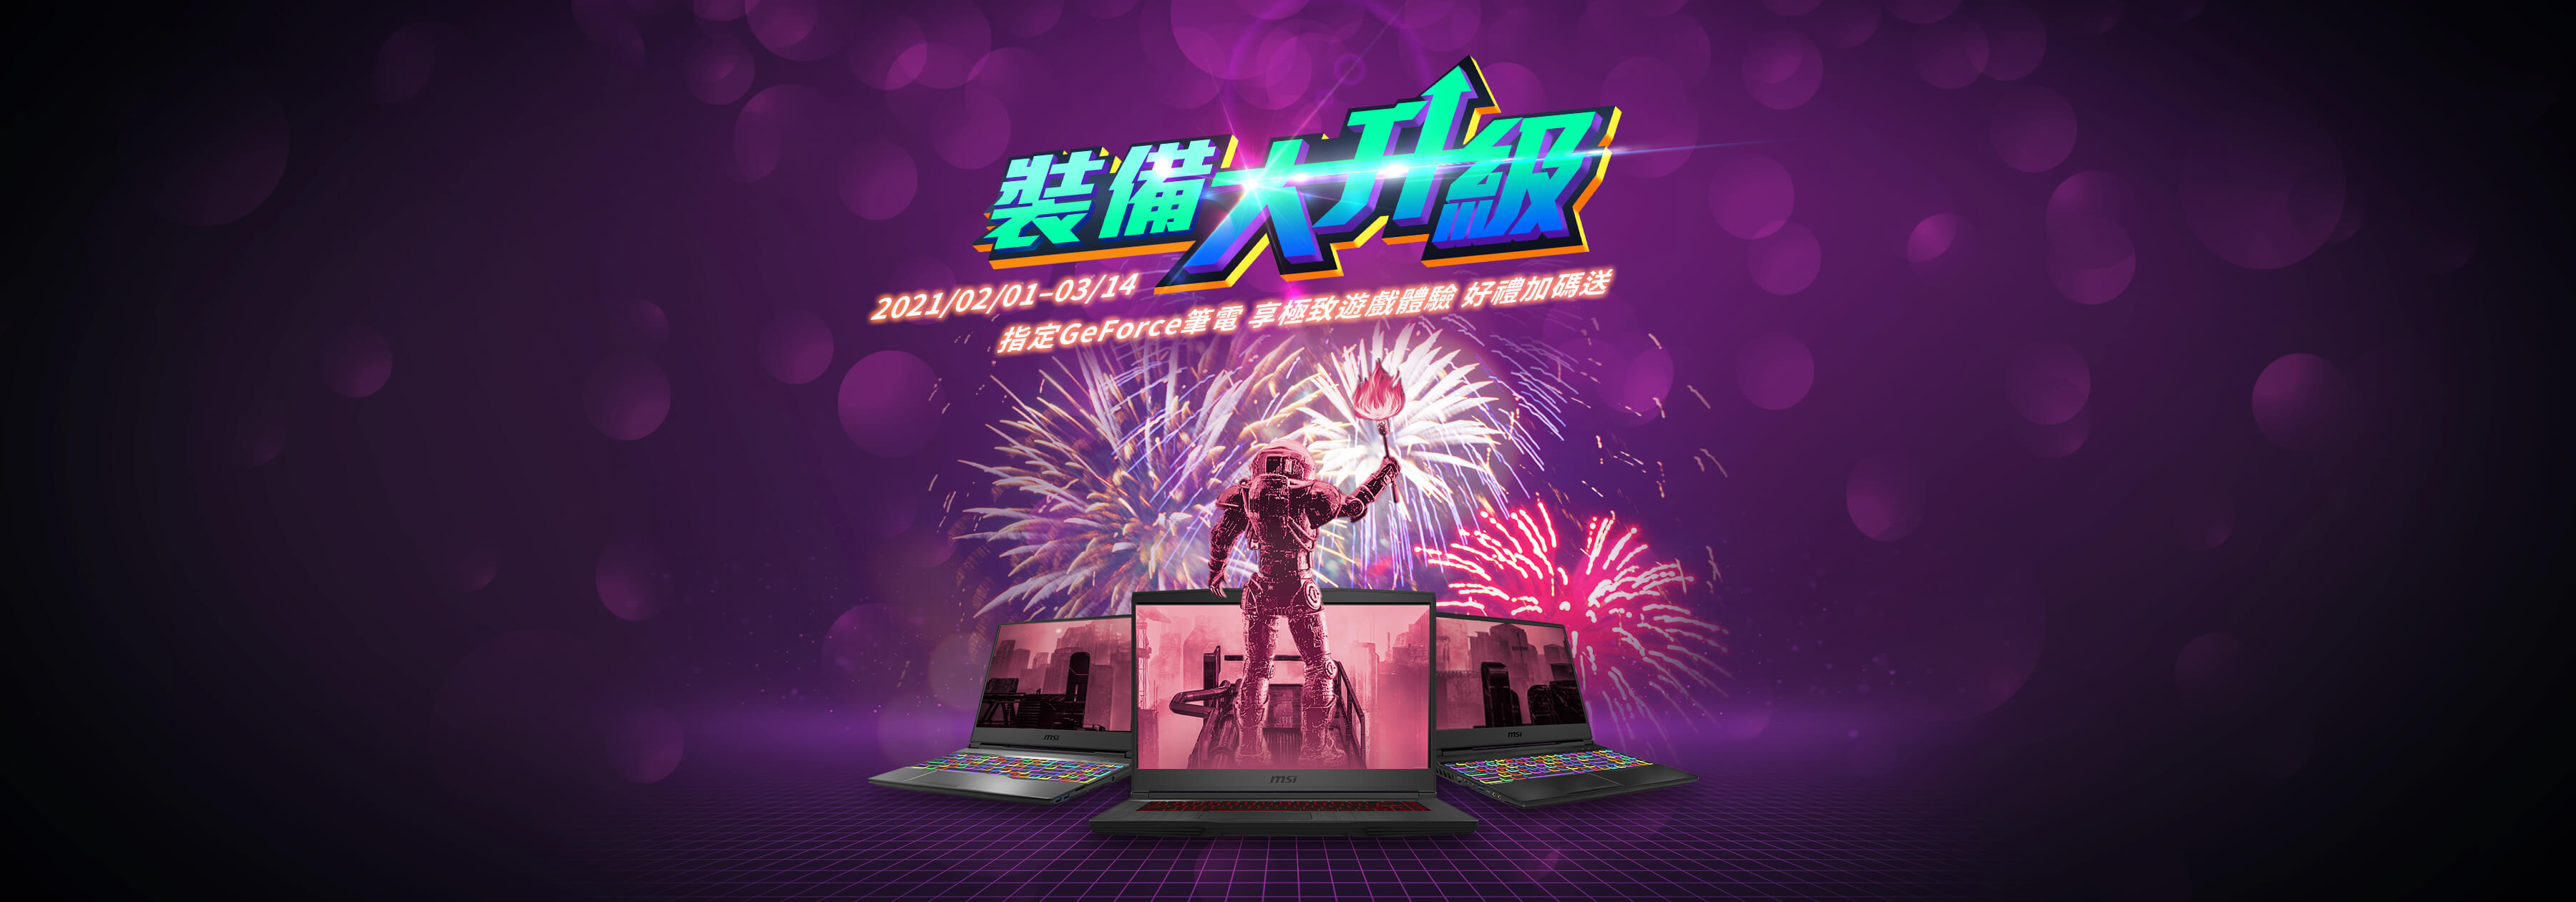 taiwan msi 2020 final sale event banner01